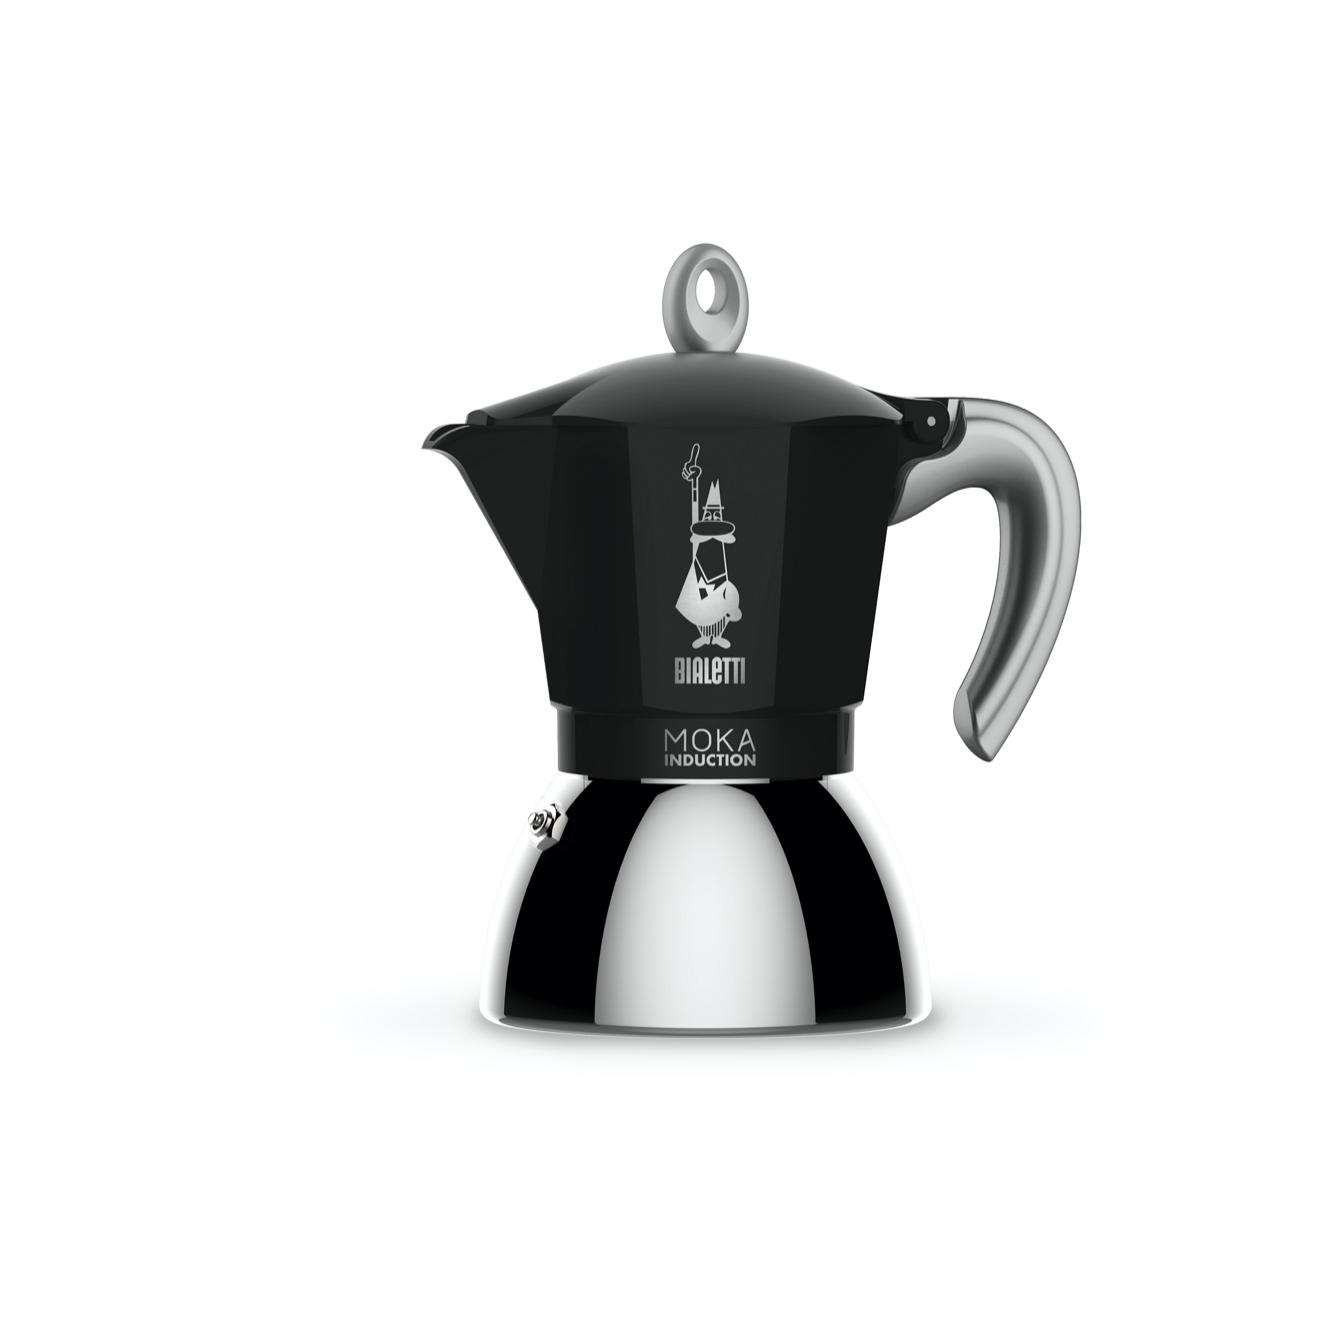 Bialetti - Moka Induction Edition 2.0 - 2 Cups - Black (6932)